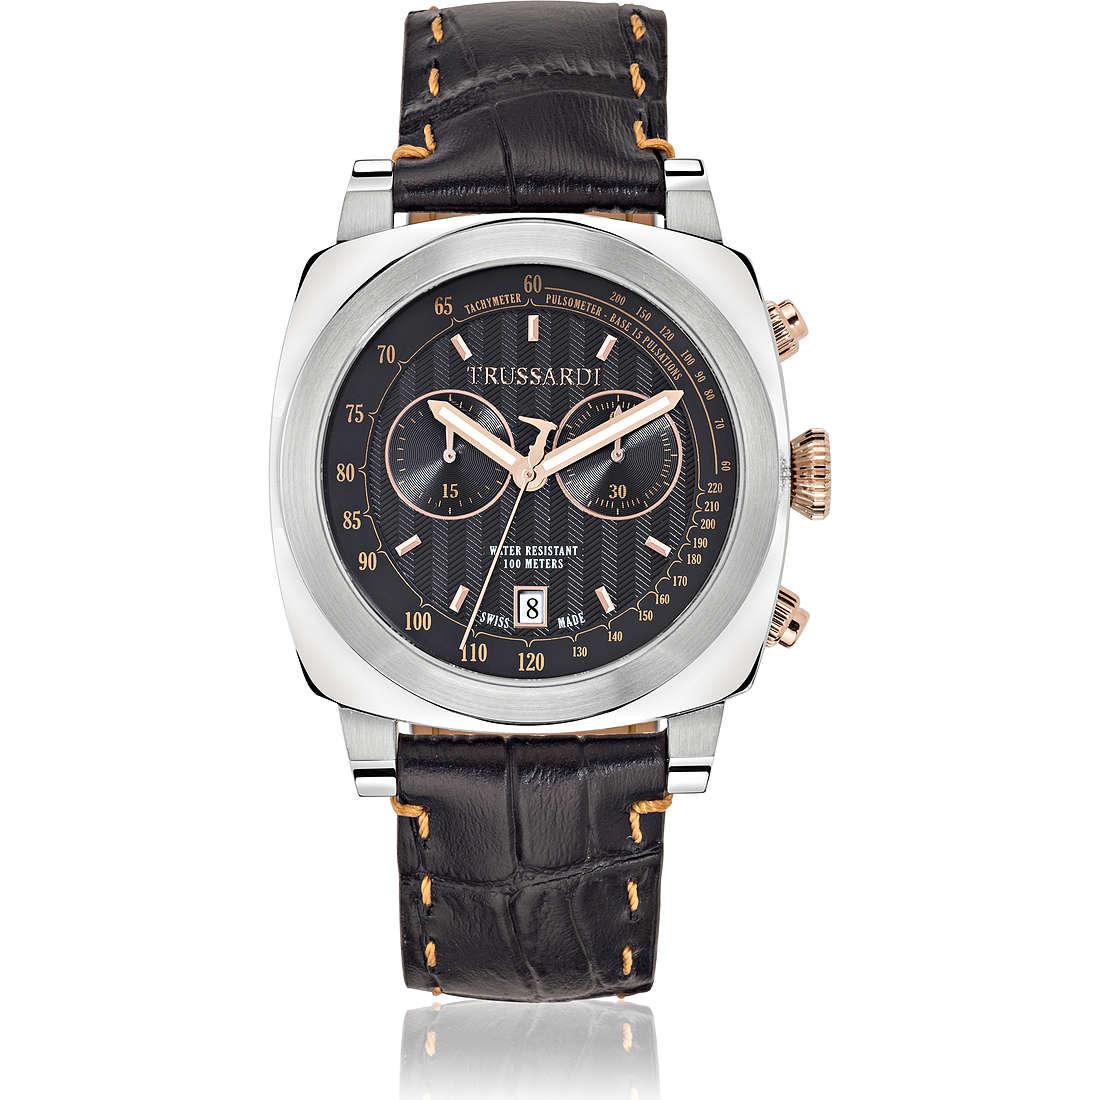 montre chronographe homme Trussardi 1911 R2471602001